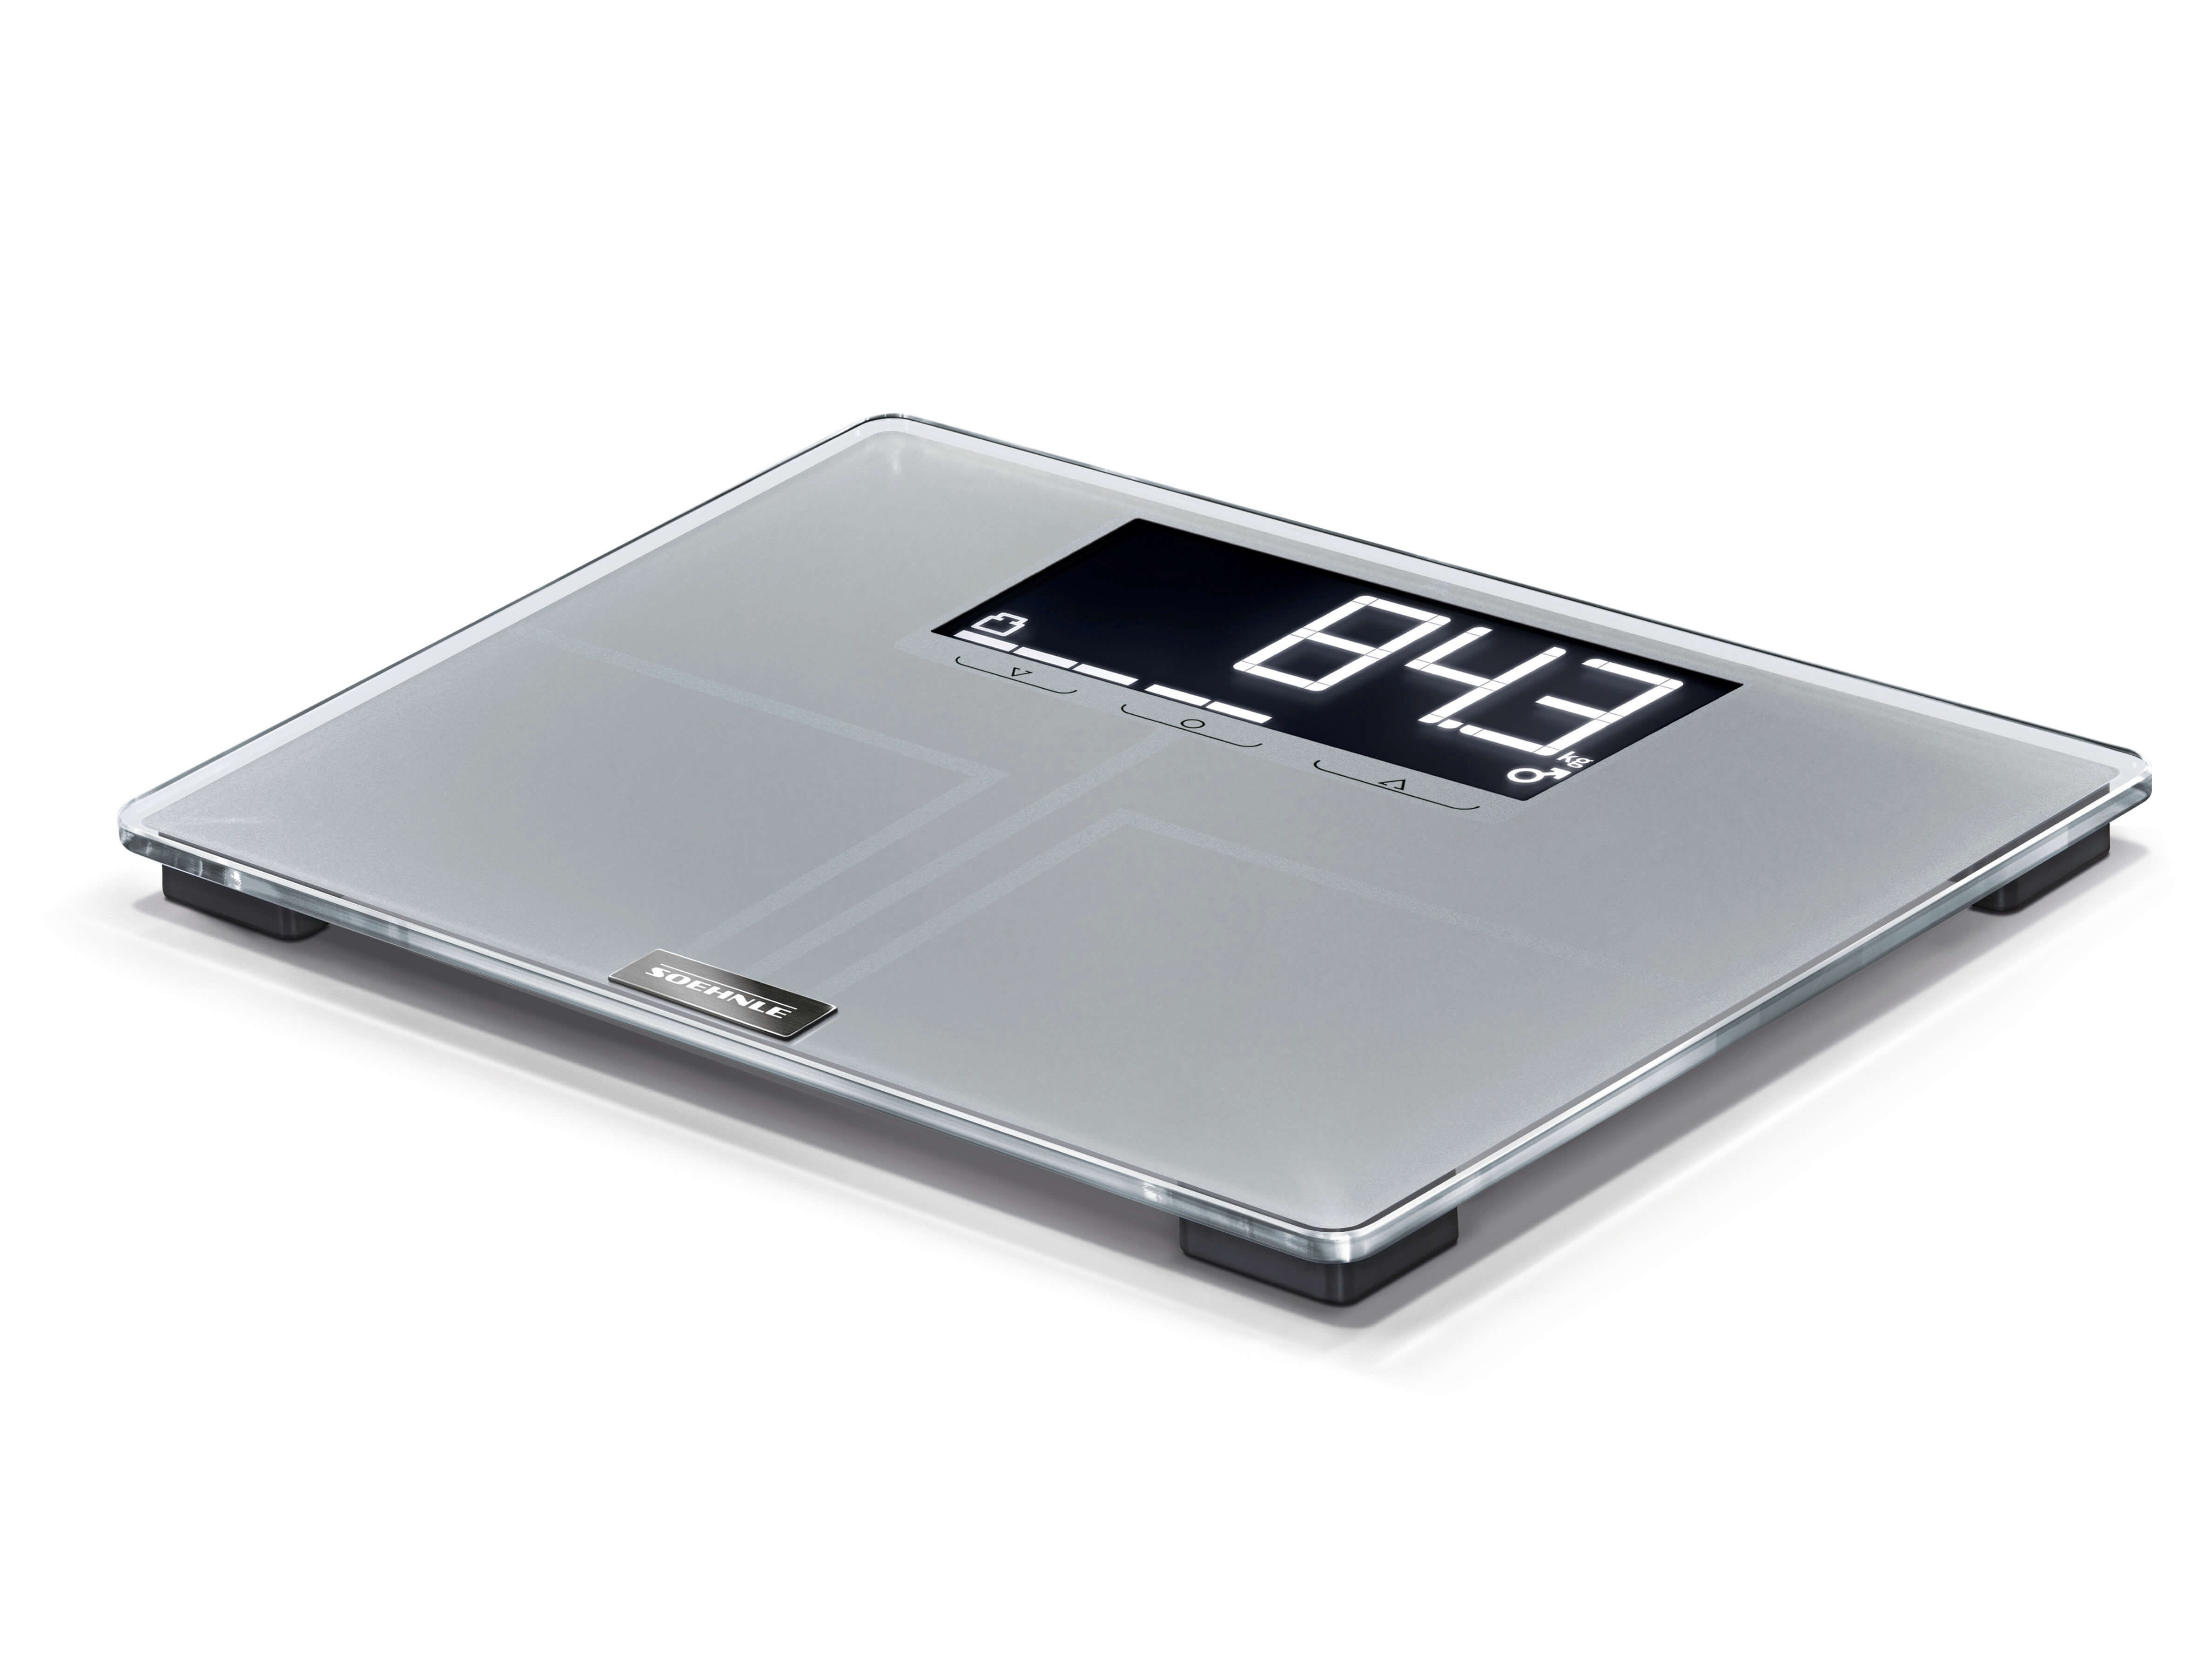 Soehnle osobní váha Shape Sense Profi 300 63869